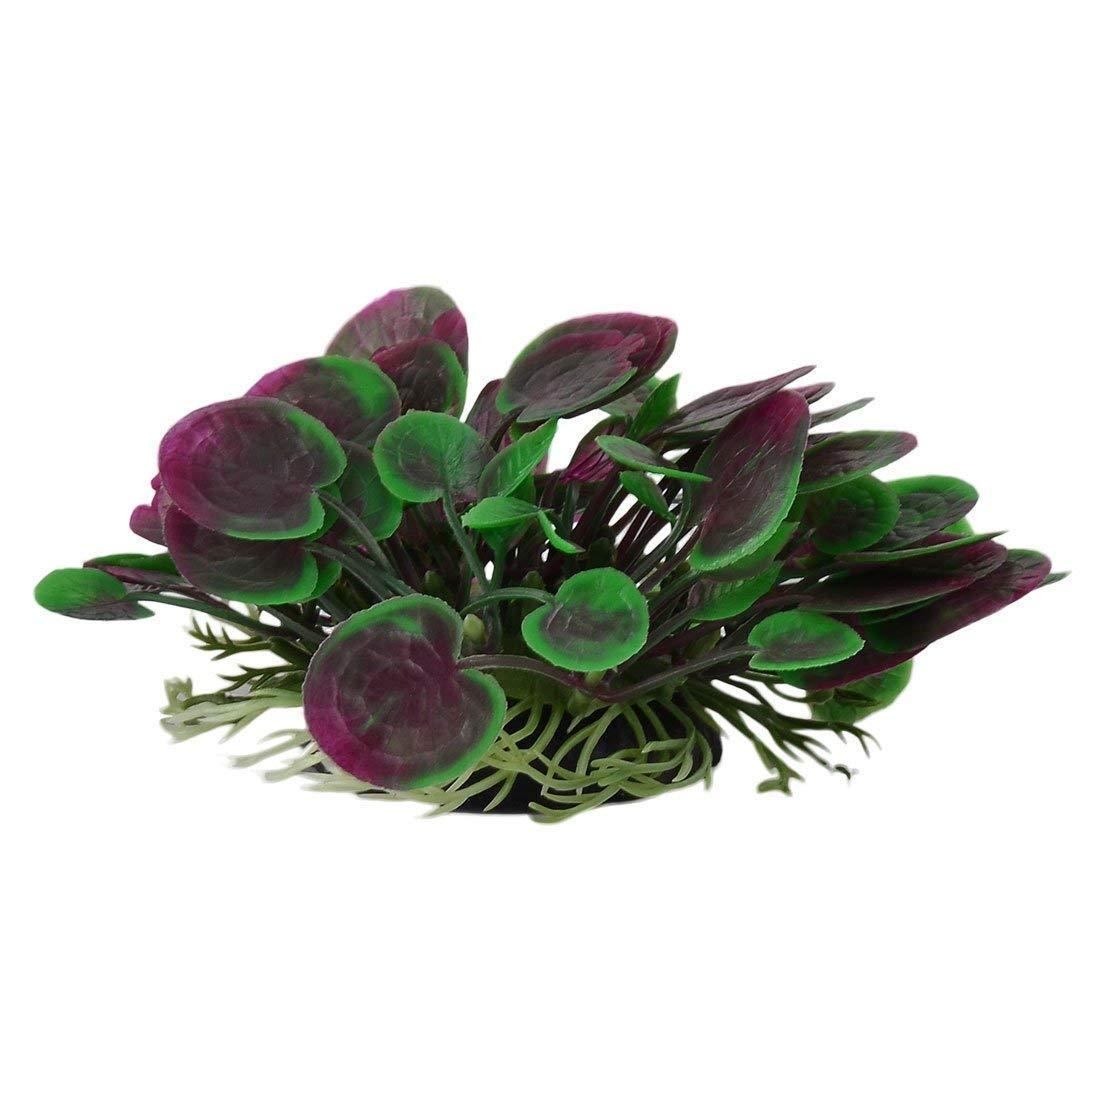 1Pc Aquarium Fish Tank Artificial Flower Water Plant Decor Ornament purple Green